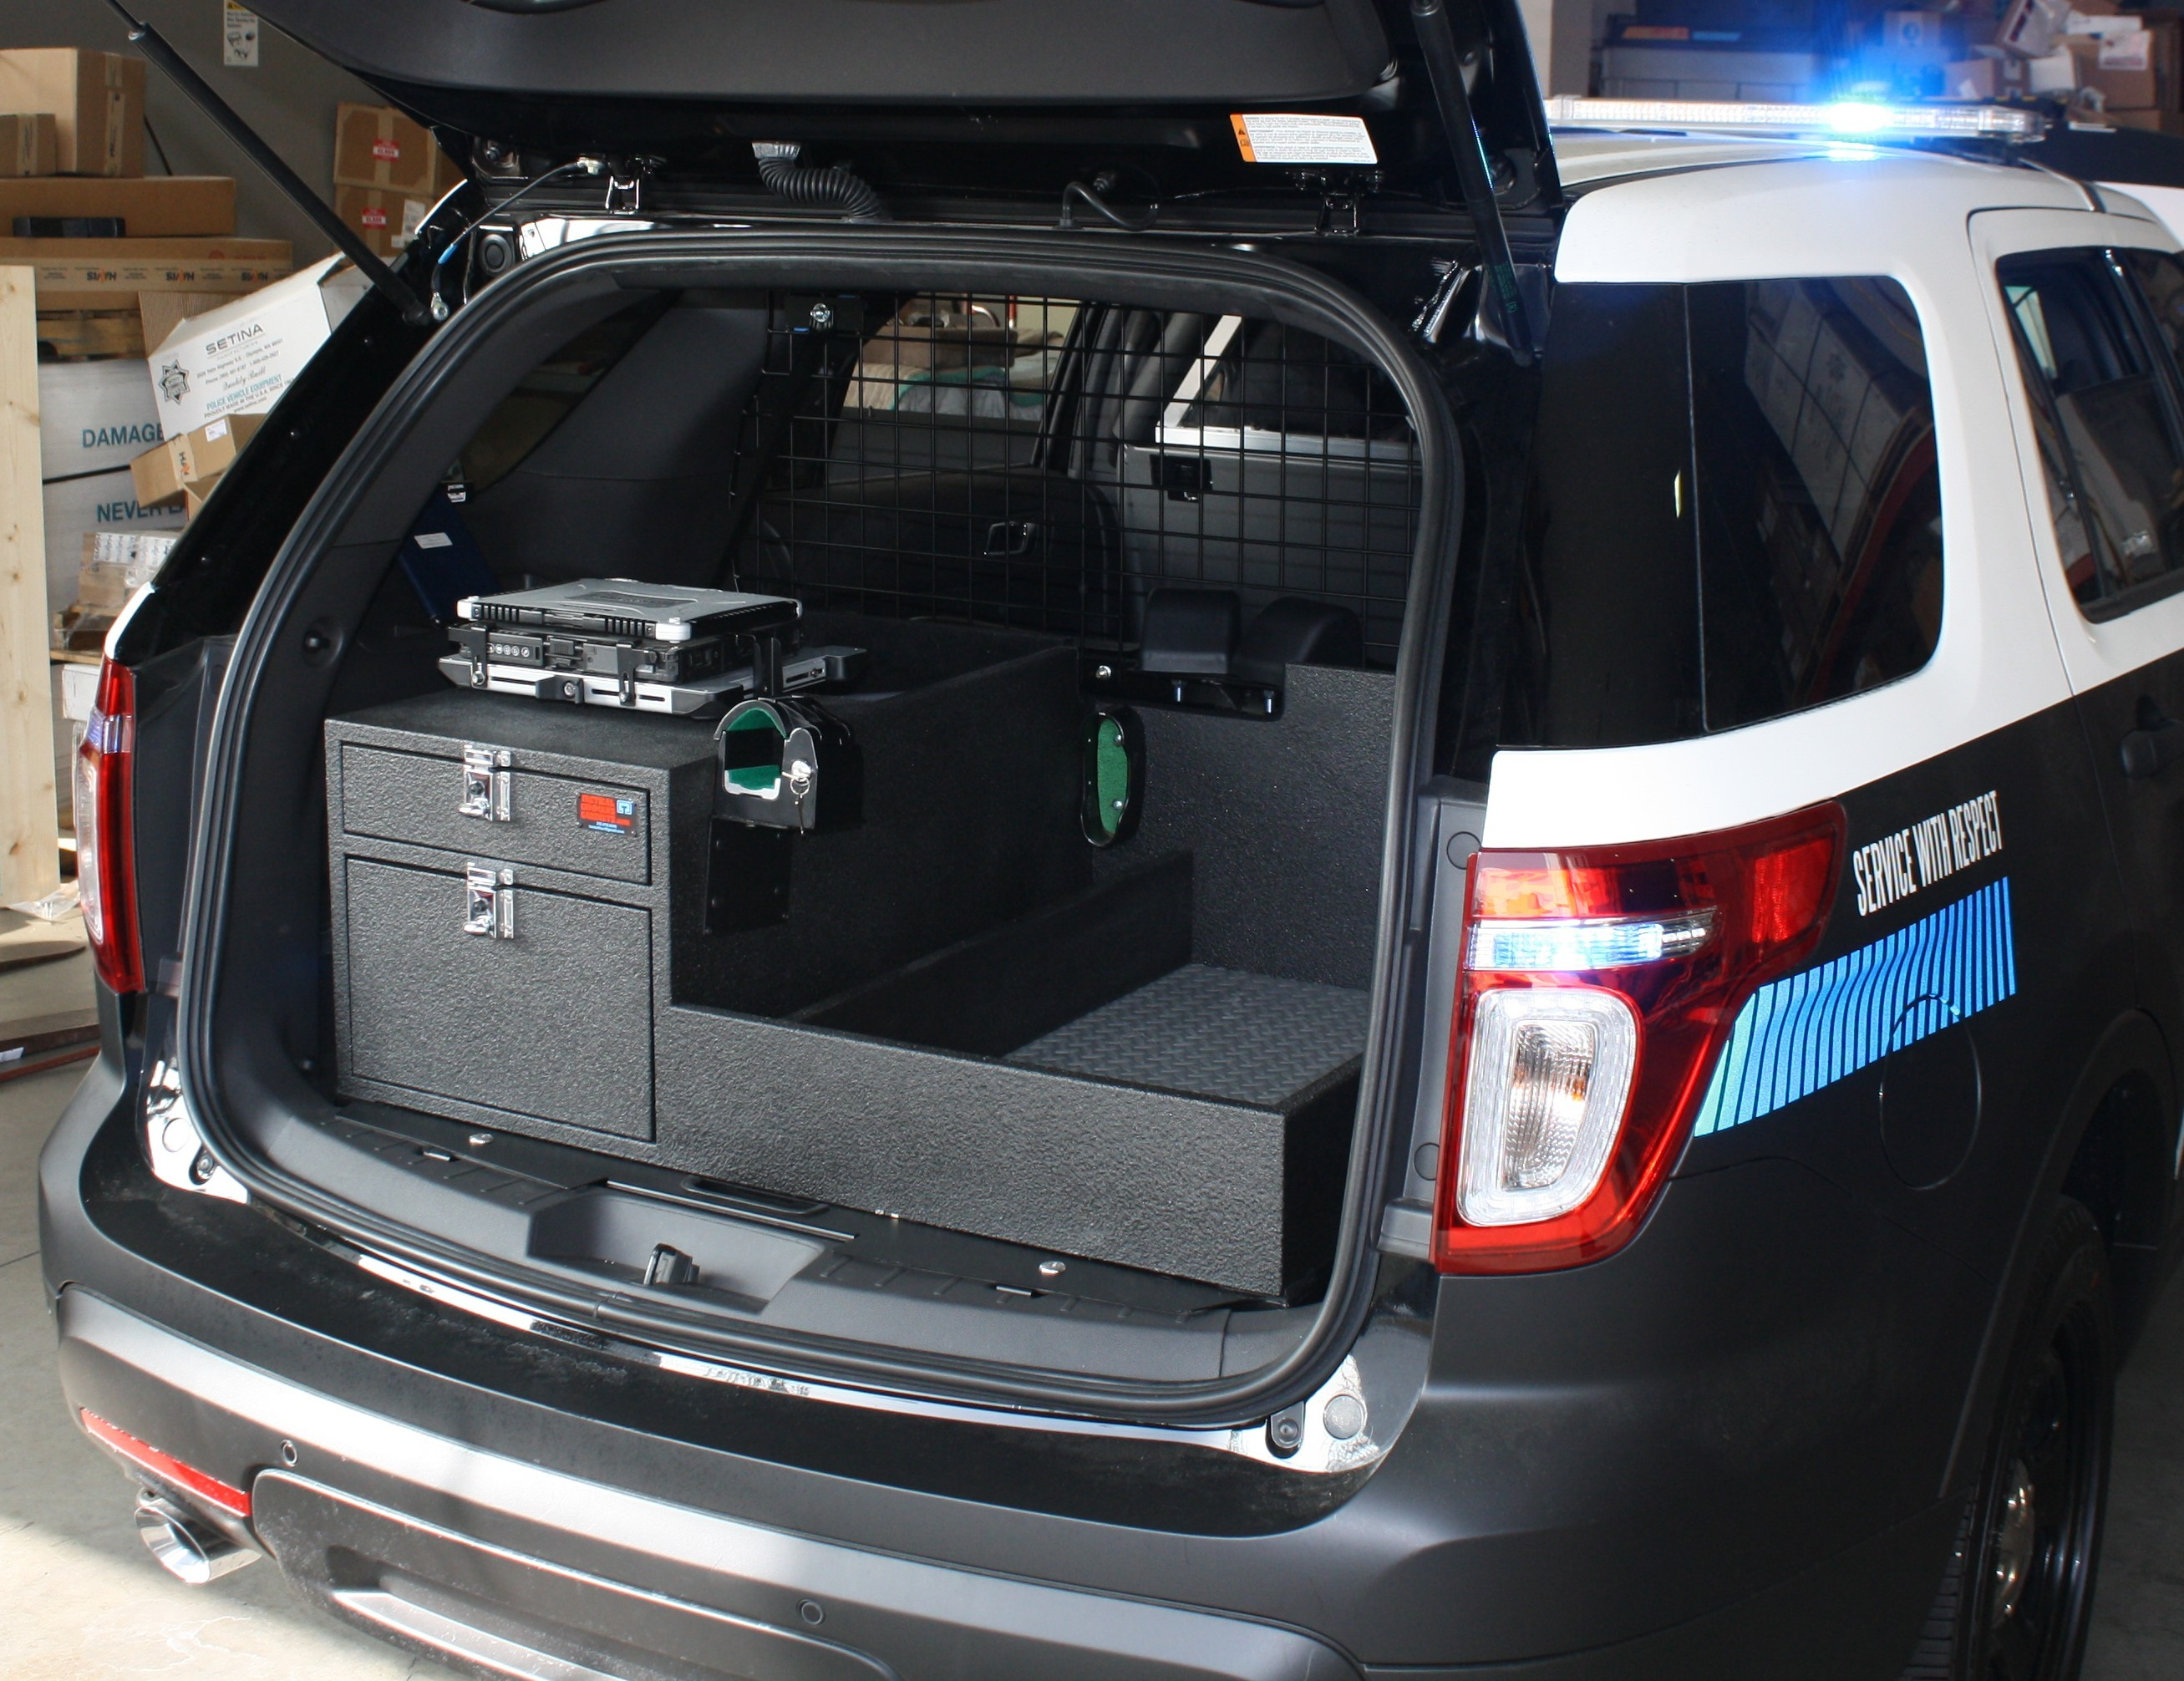 Police ford explorer cabinet storage